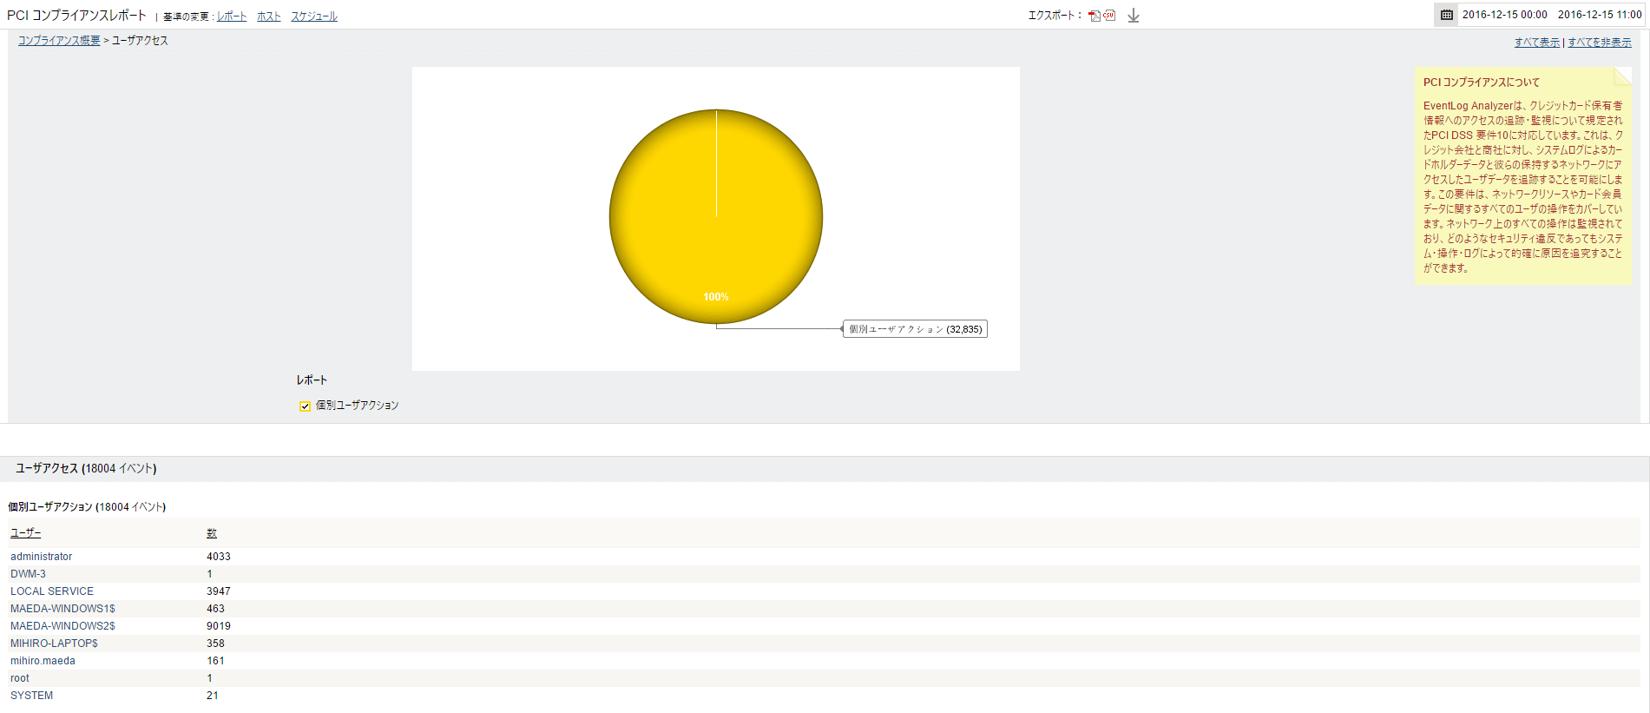 PCI-DSS個別ユーザーアクションレポート